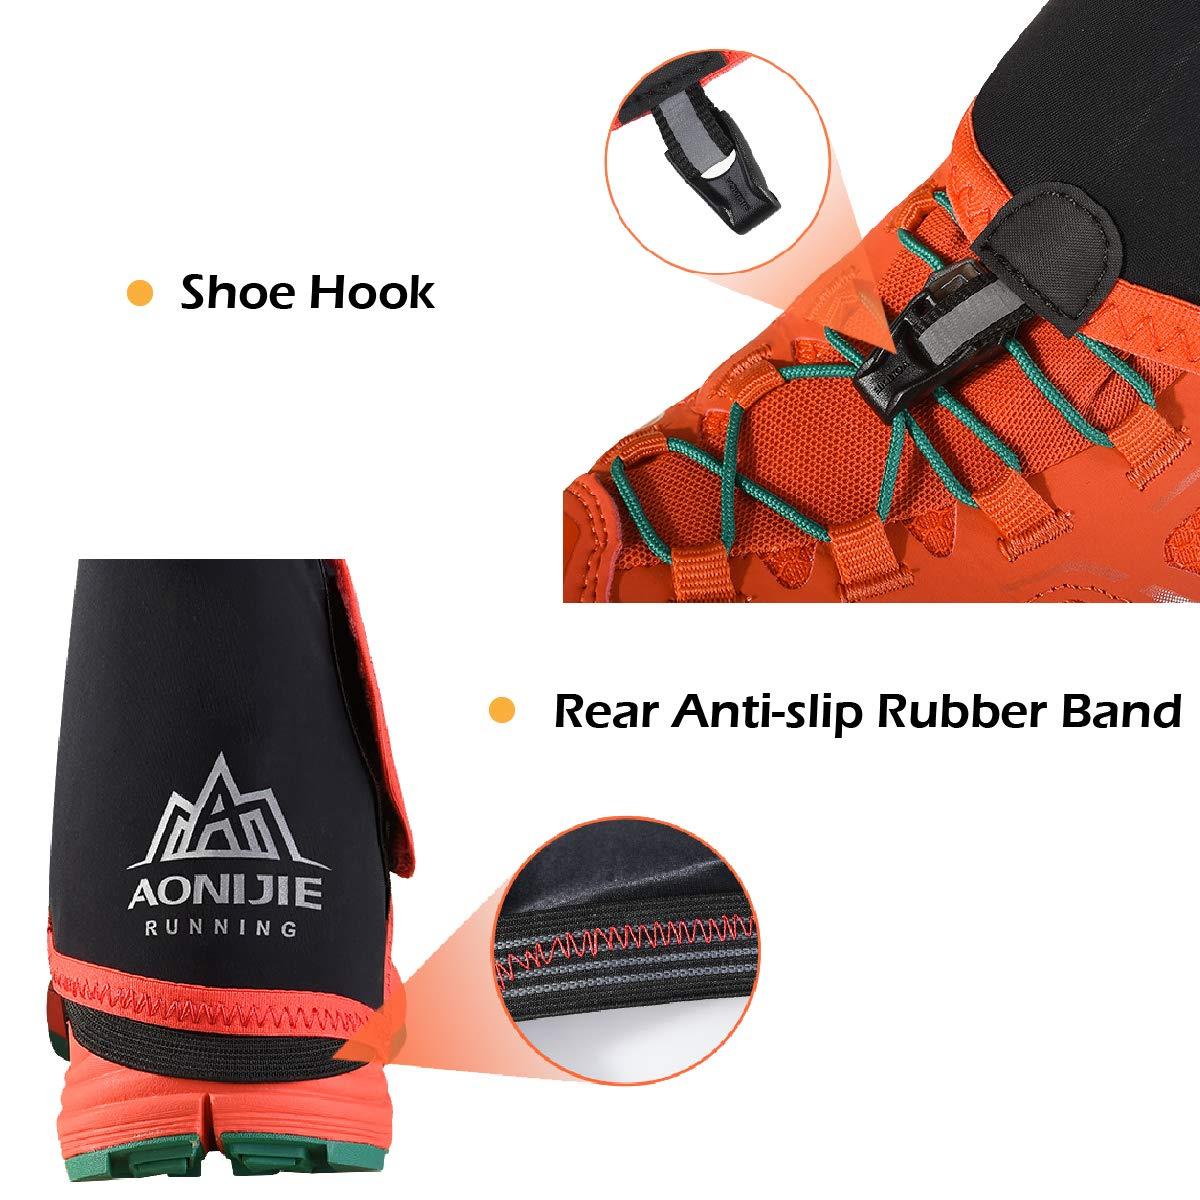 TRIWONDER Ghette da Neve Ghette Basse per Scarpe Ghette Impermeabili da Trekking Running Caccia Montagna Escursionismo Corsa per Uomo Donna